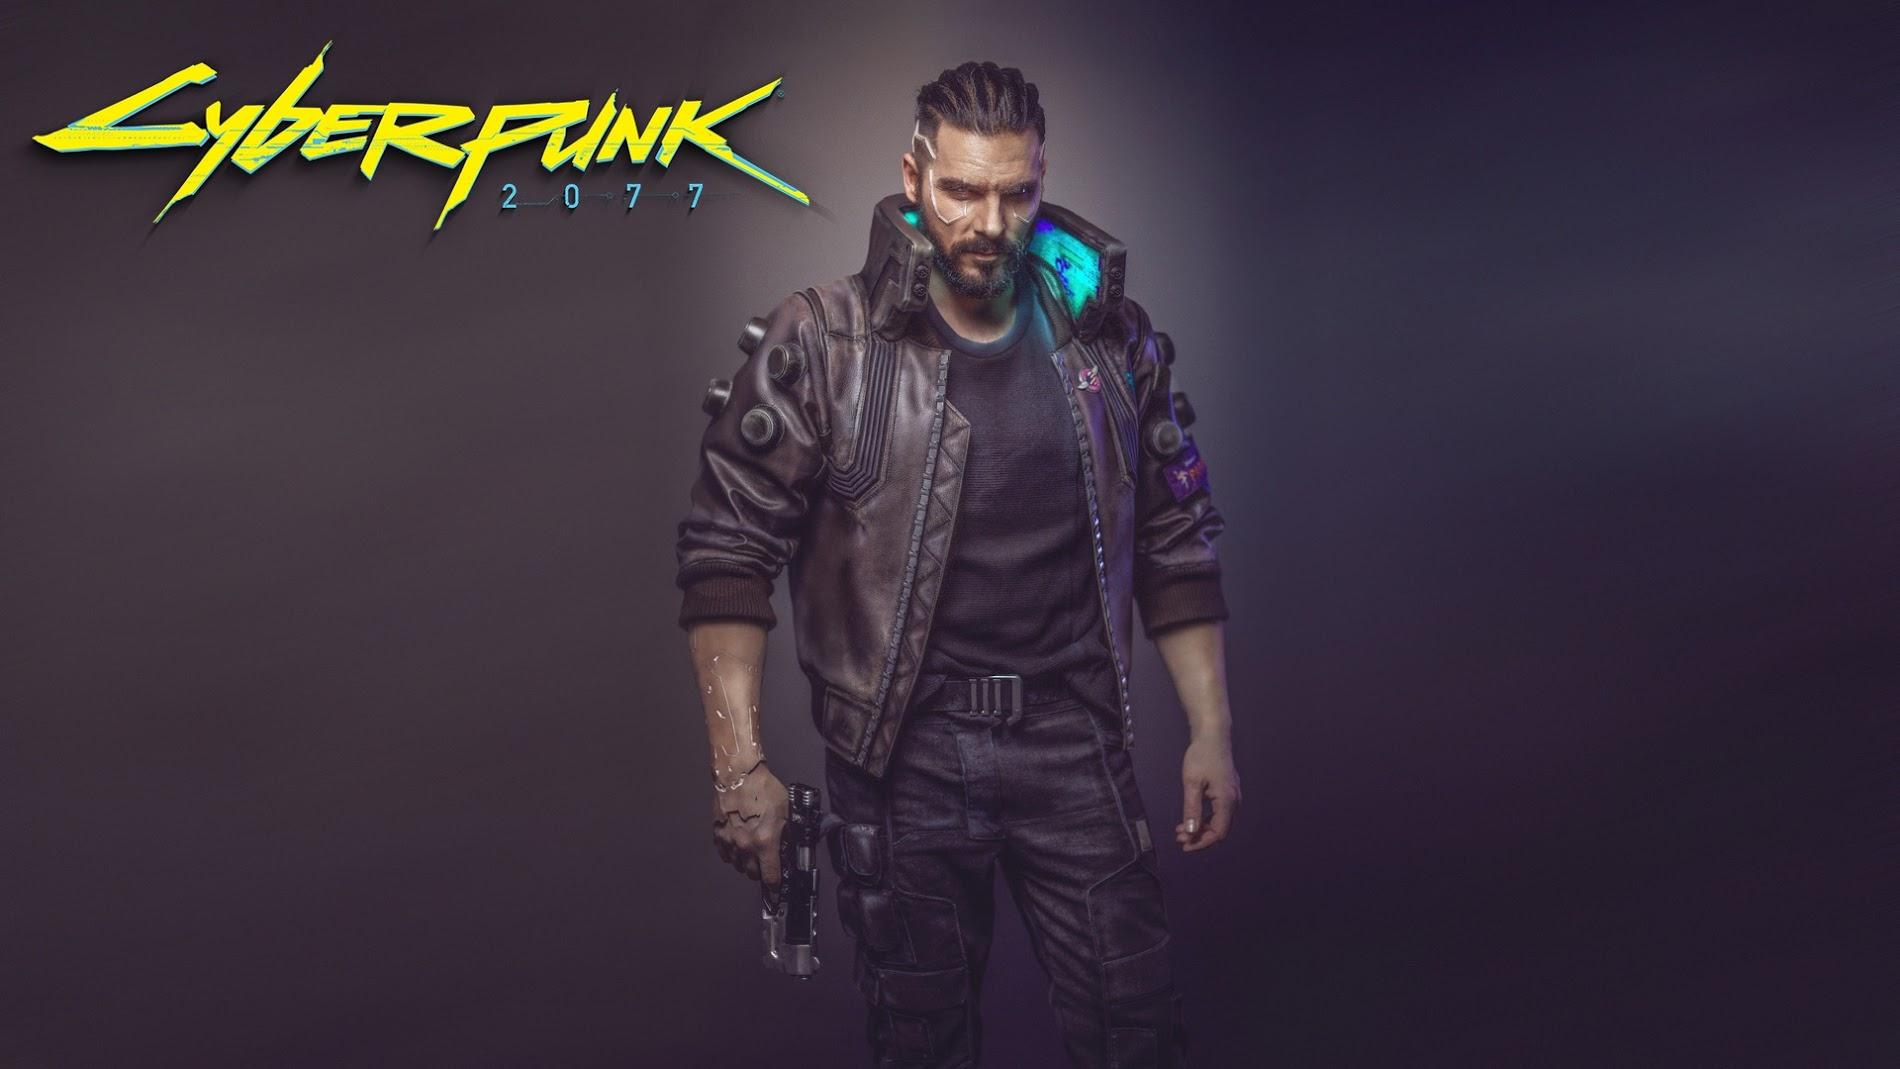 Cyberpunk 2077 HD Wallpaper